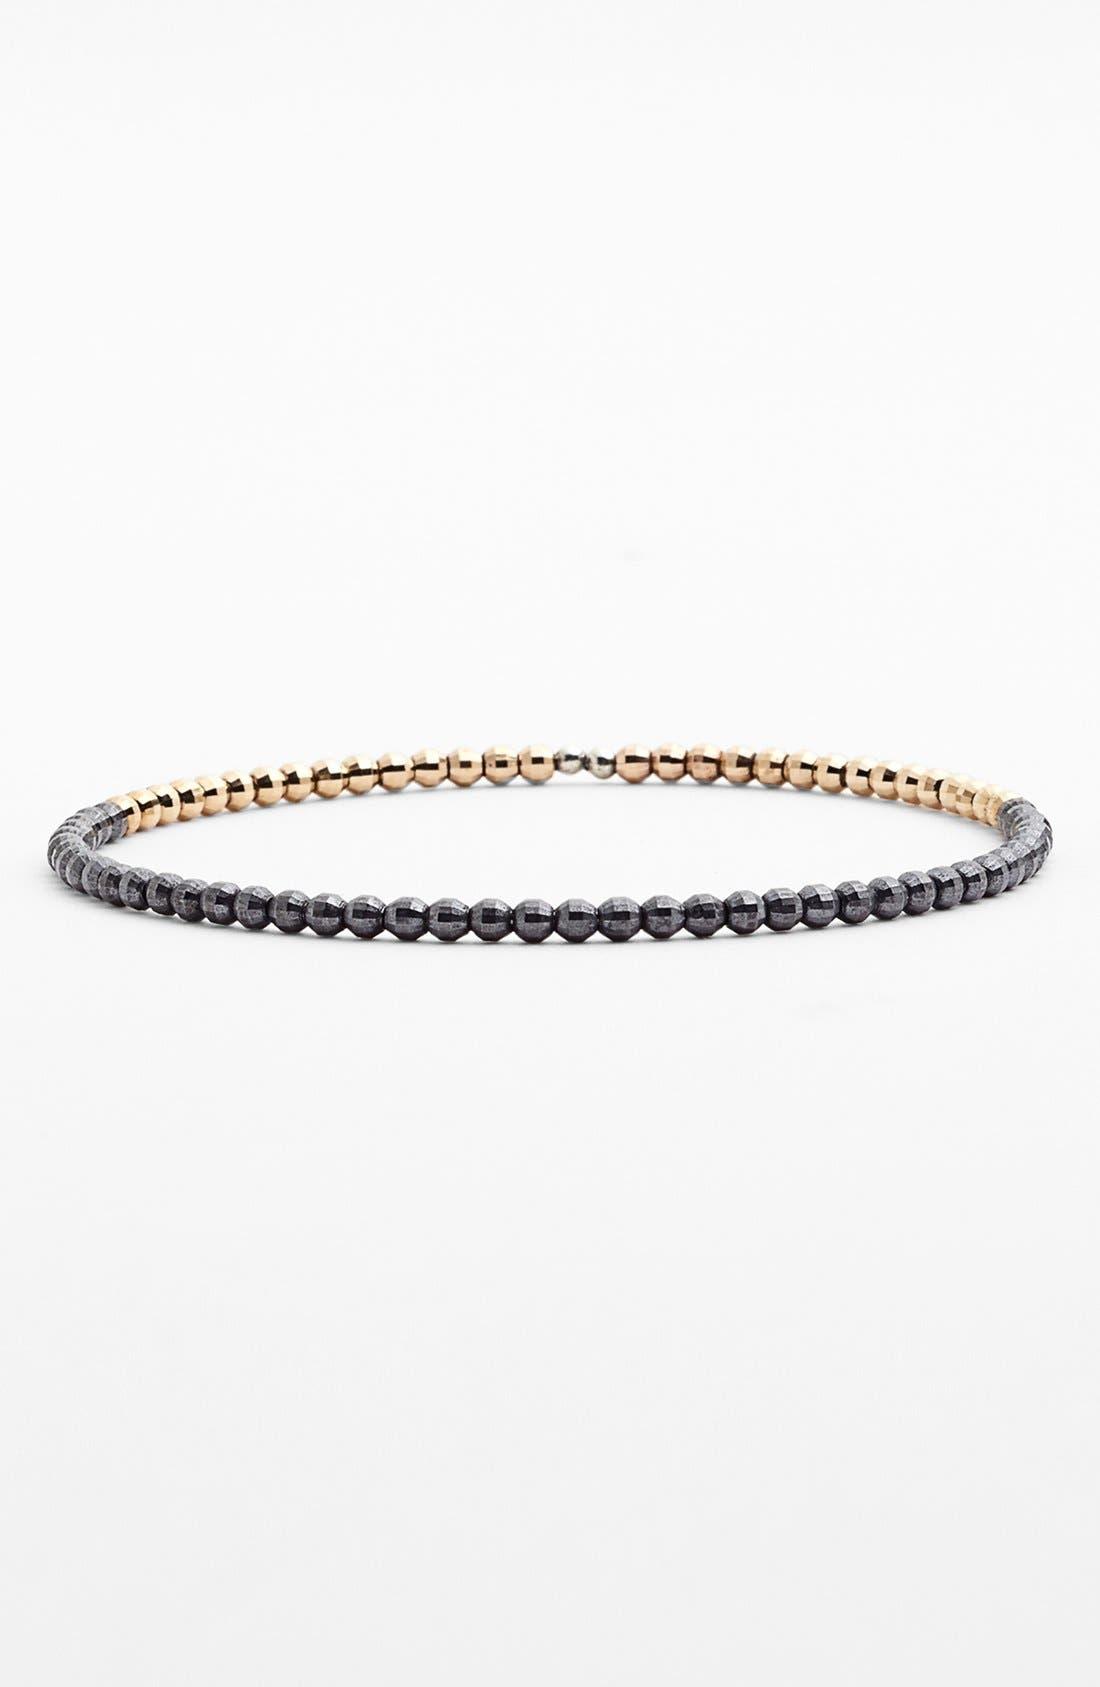 Main Image - Mizuki 'Cut Beads' Beaded Bangle